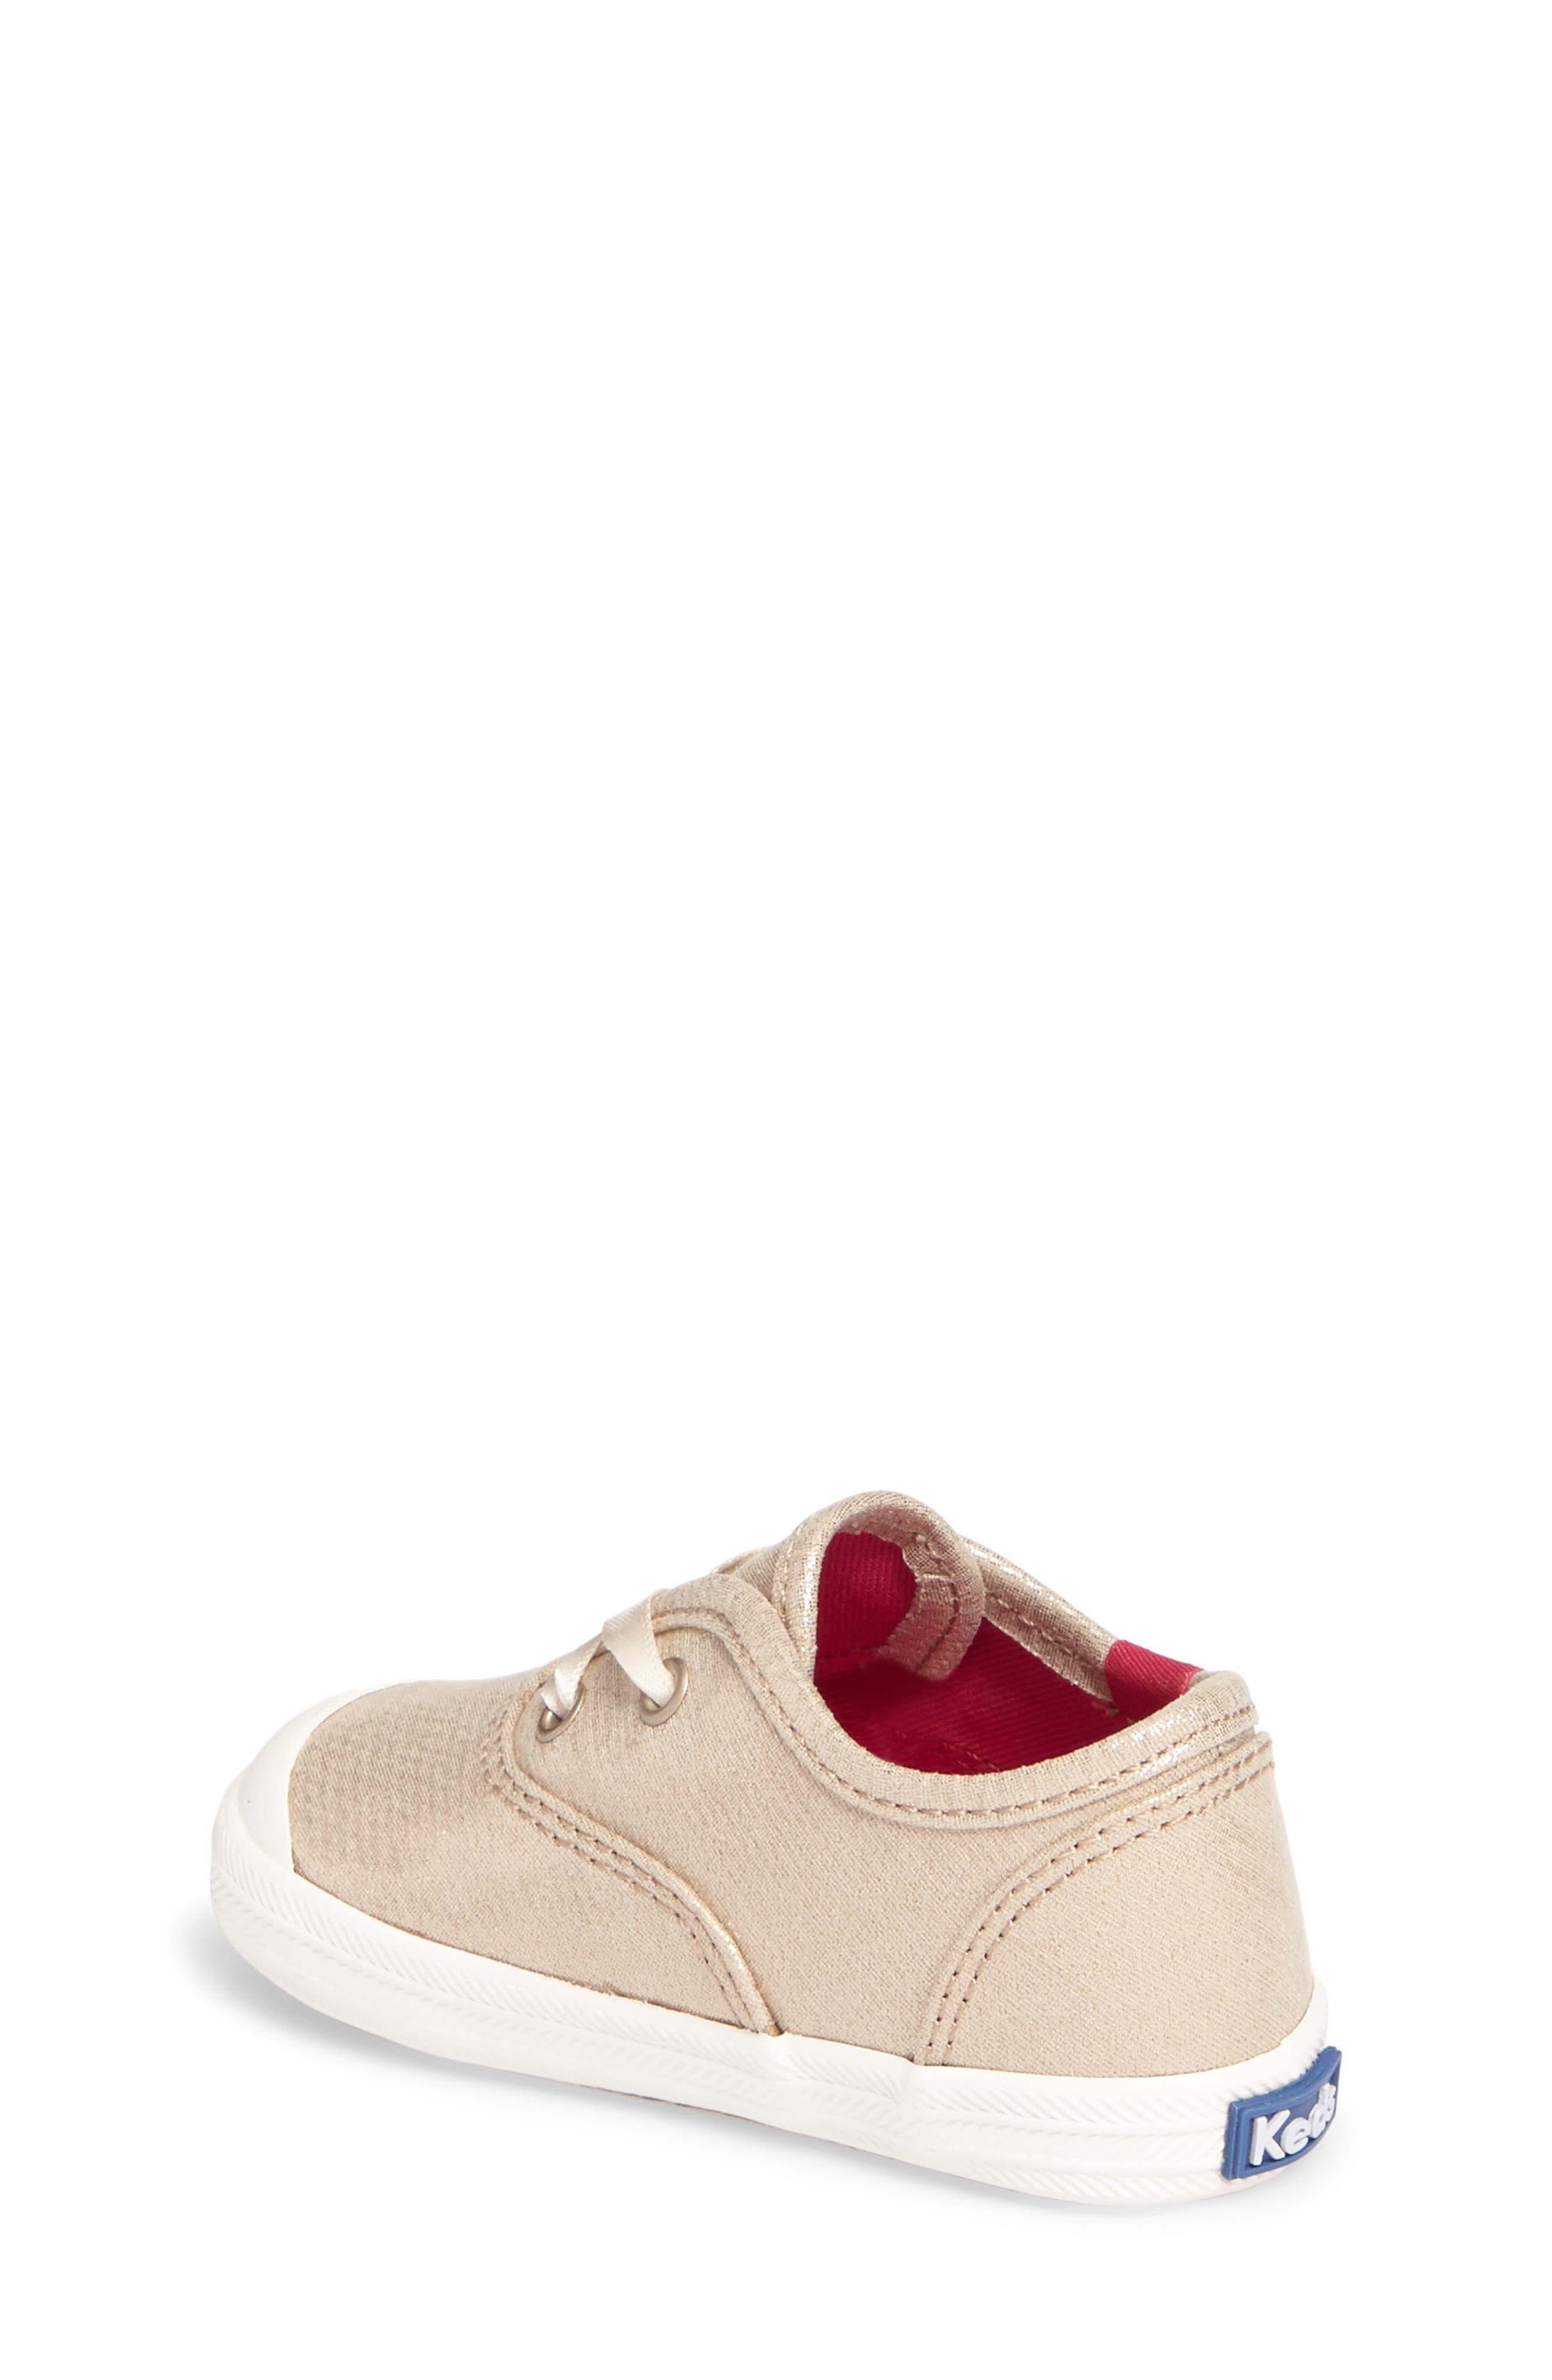 'Champion' Sneaker,                             Alternate thumbnail 2, color,                             710